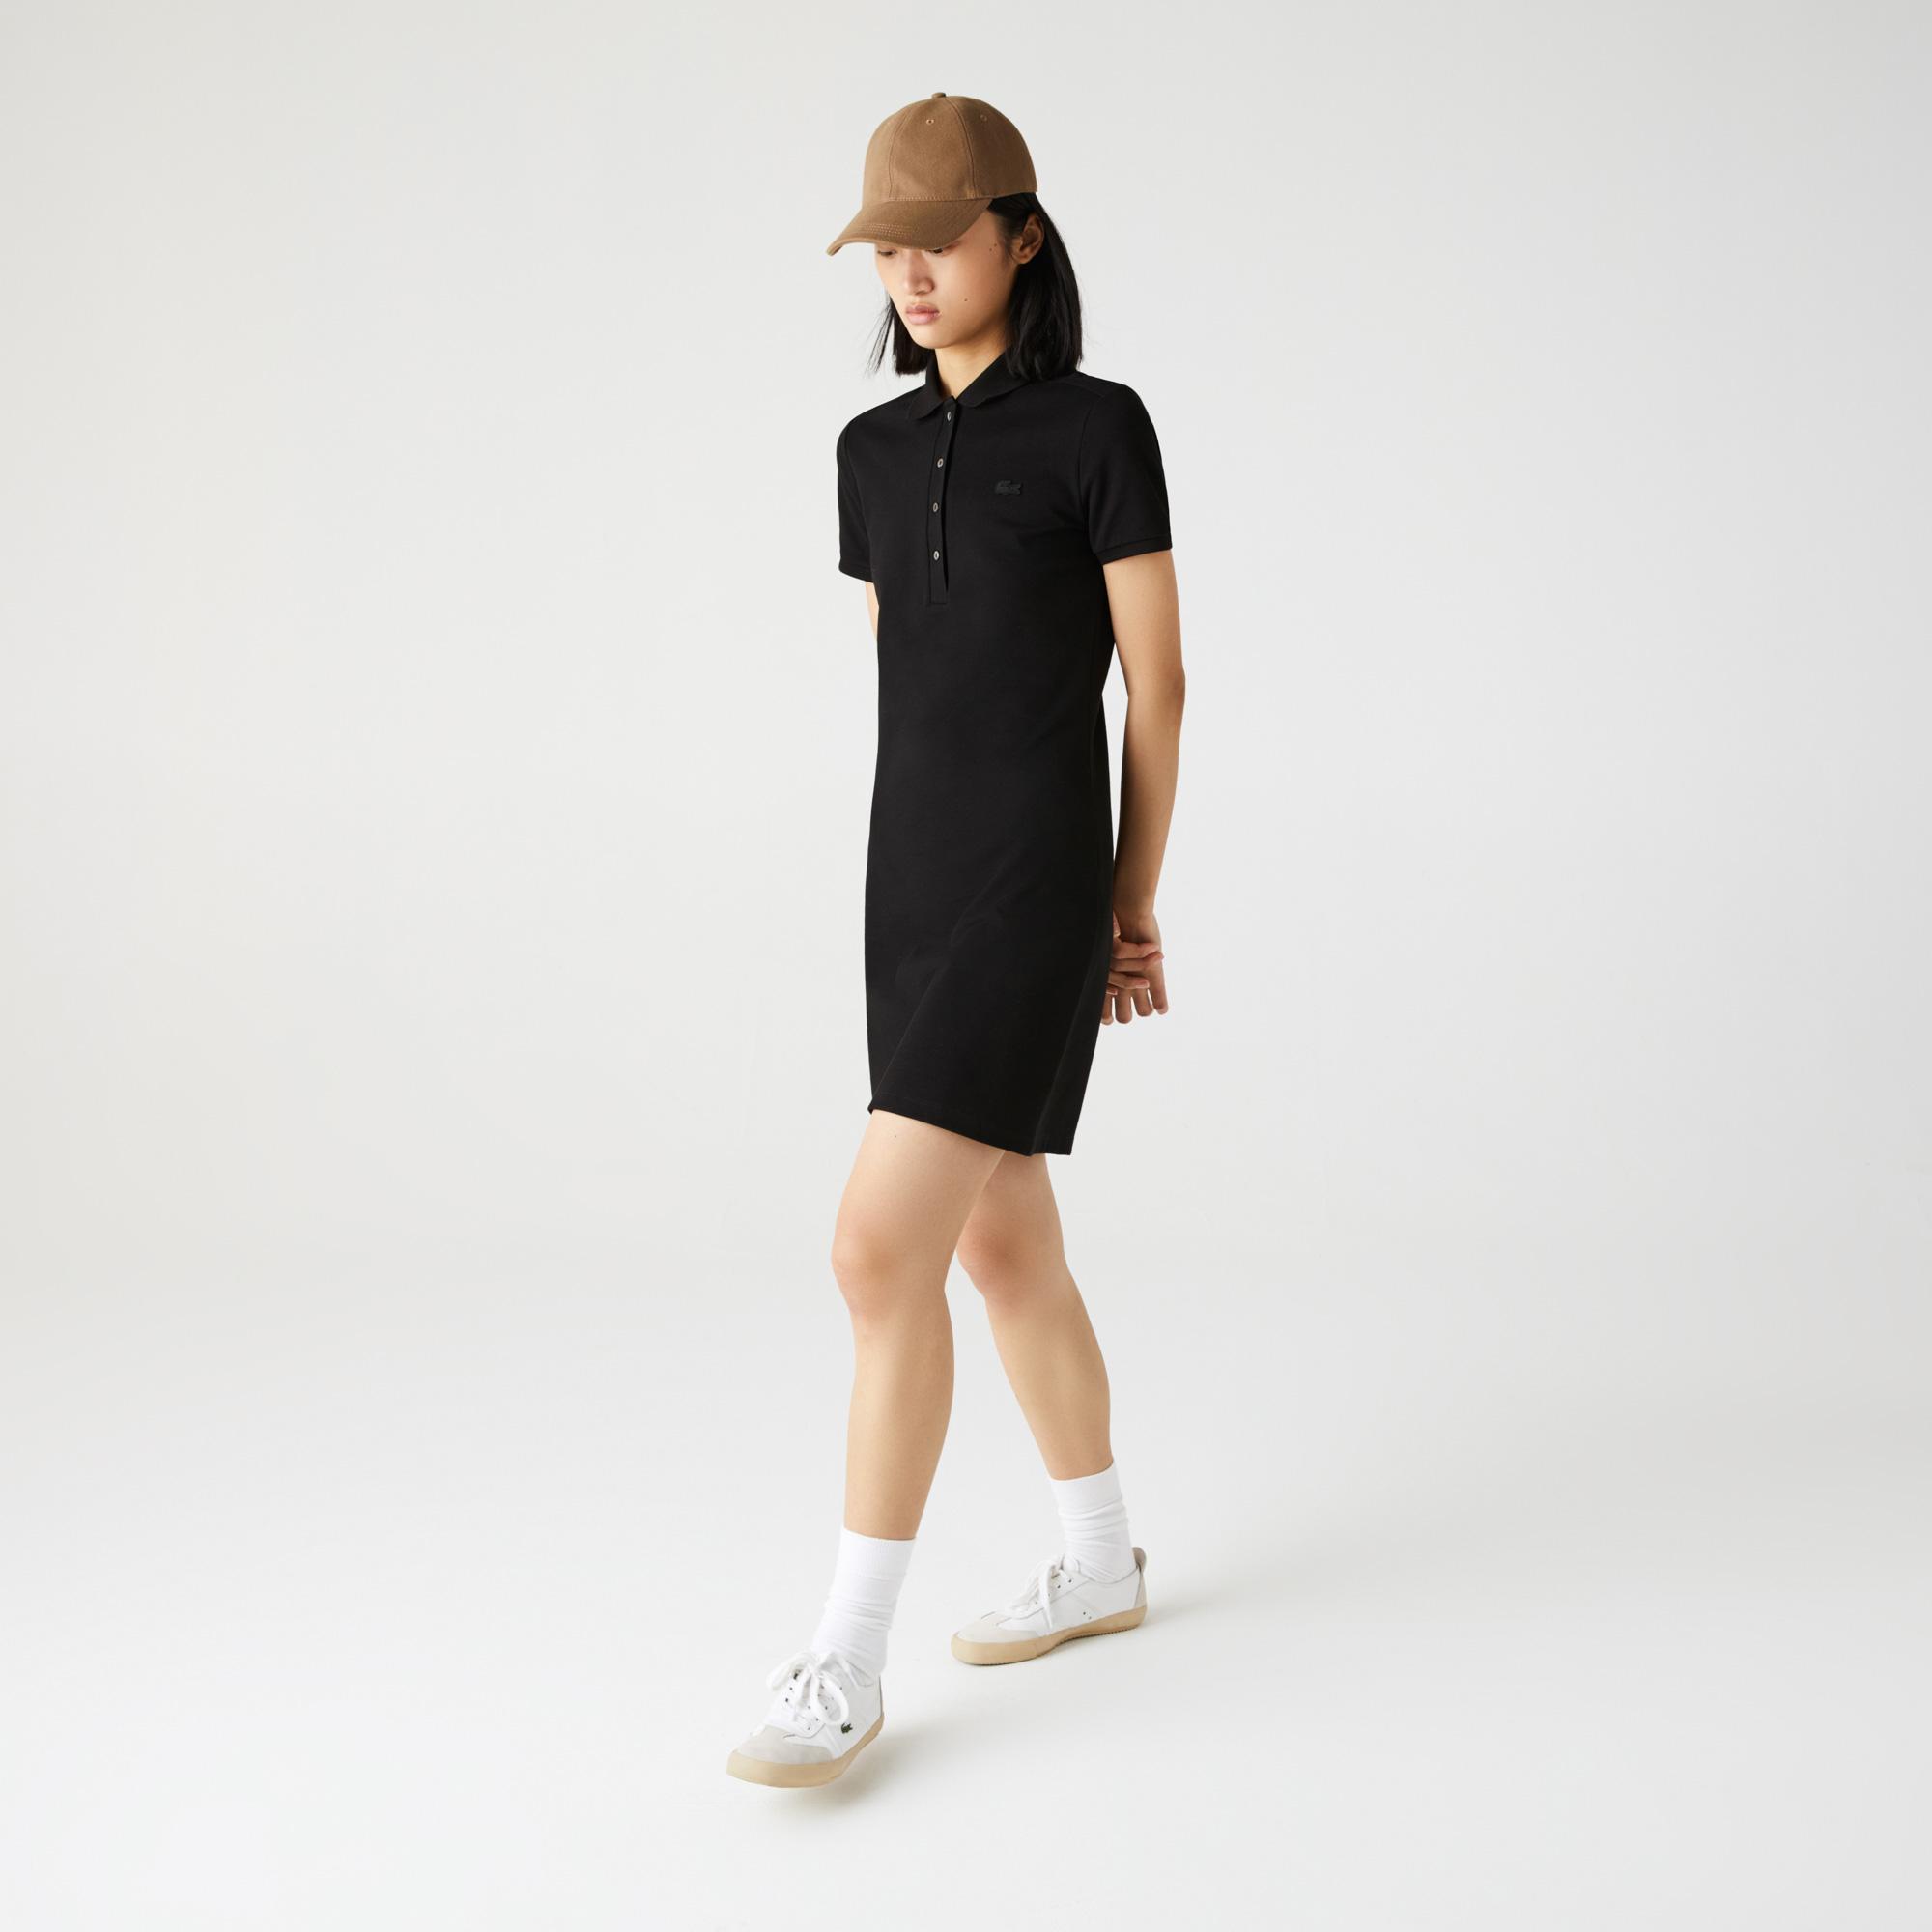 Lacoste Kadın Siyah Polo Yaka Elbise